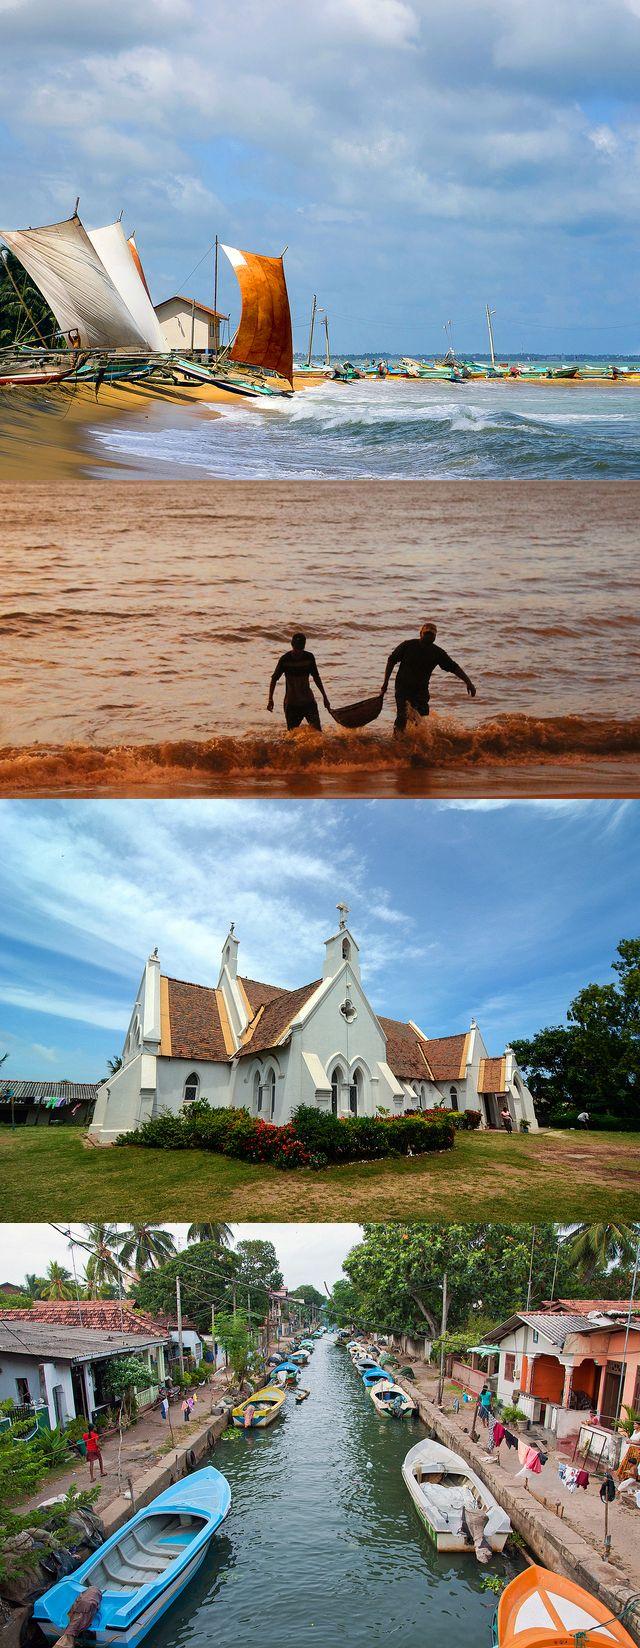 Negombo, western coast of Sri Lanka #SriLanka #Negombo #Church #Boats #Beach #DutchChannel